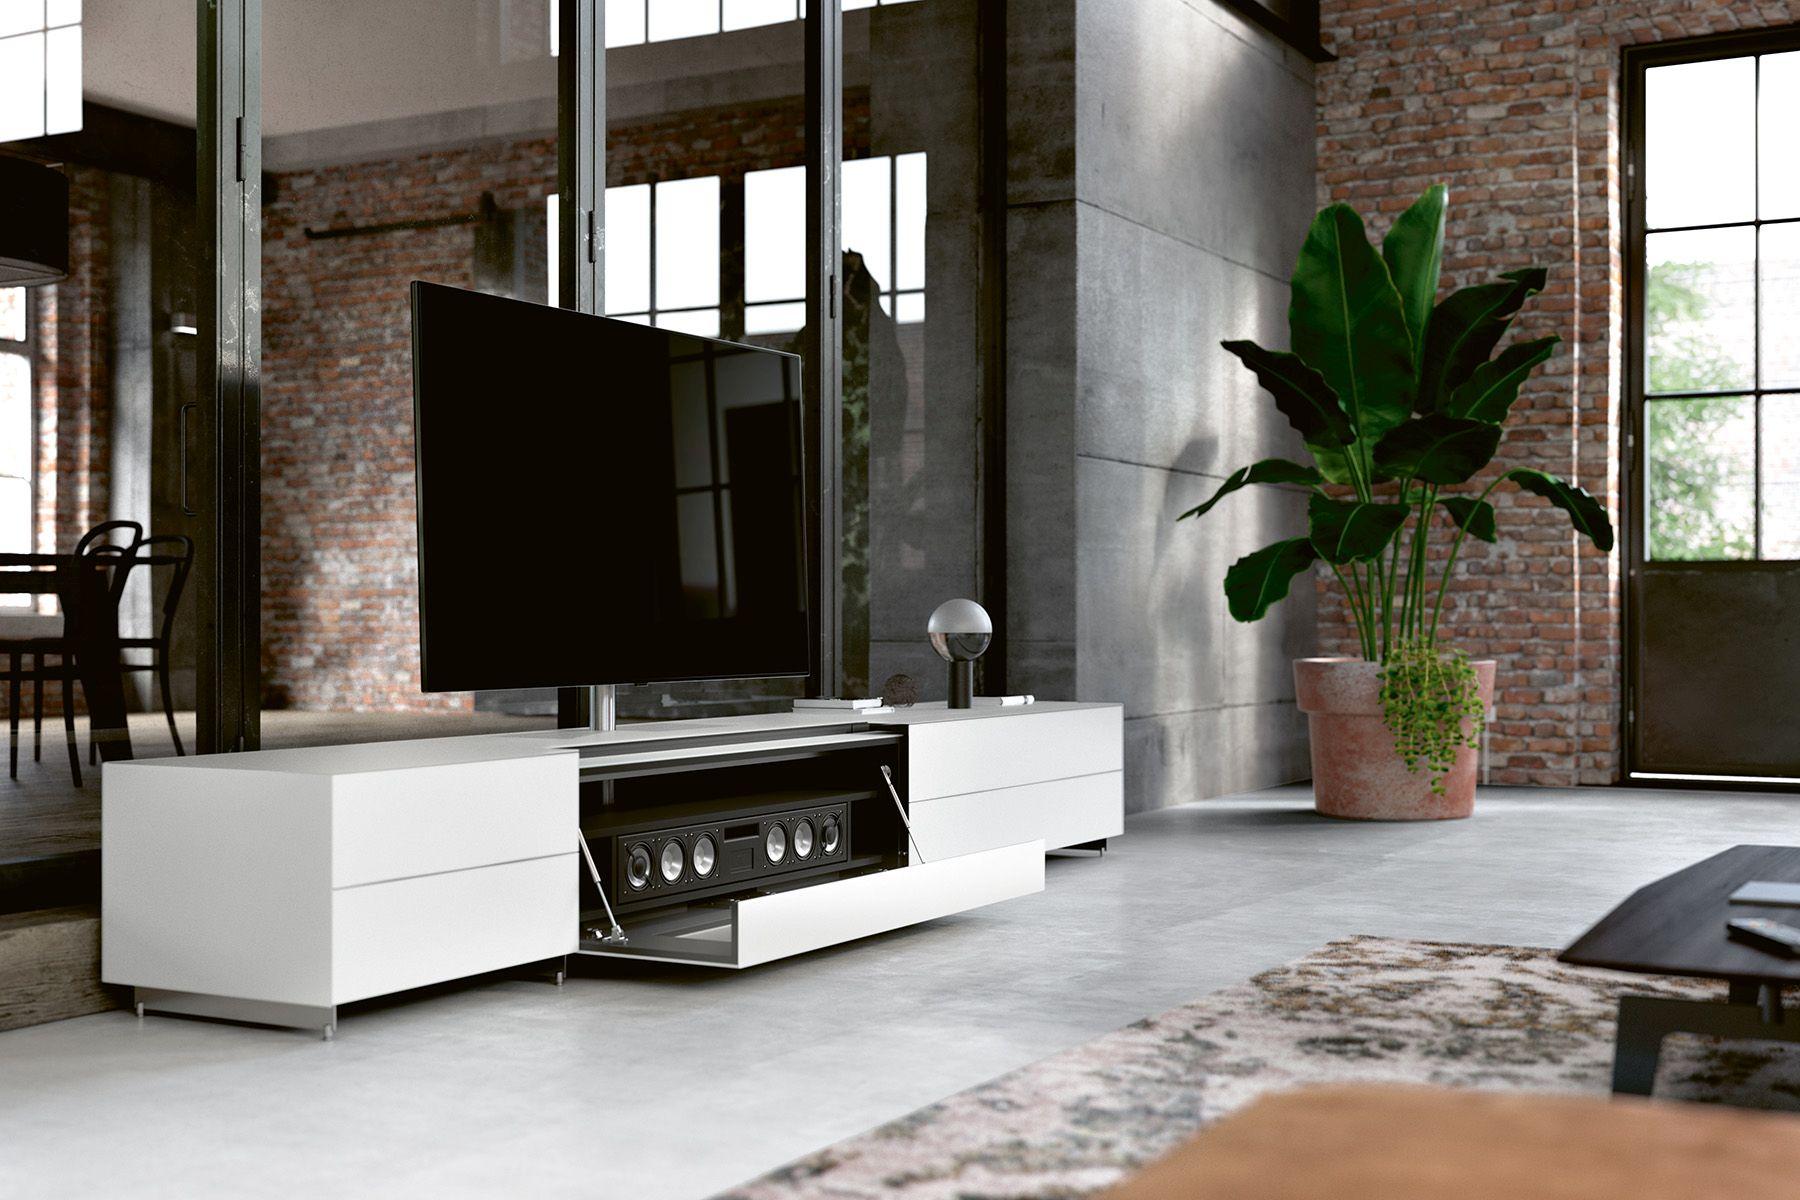 Spectral Brick Tv Meubel.Design Tv Meubels Tv Meubel Kopen Leiden